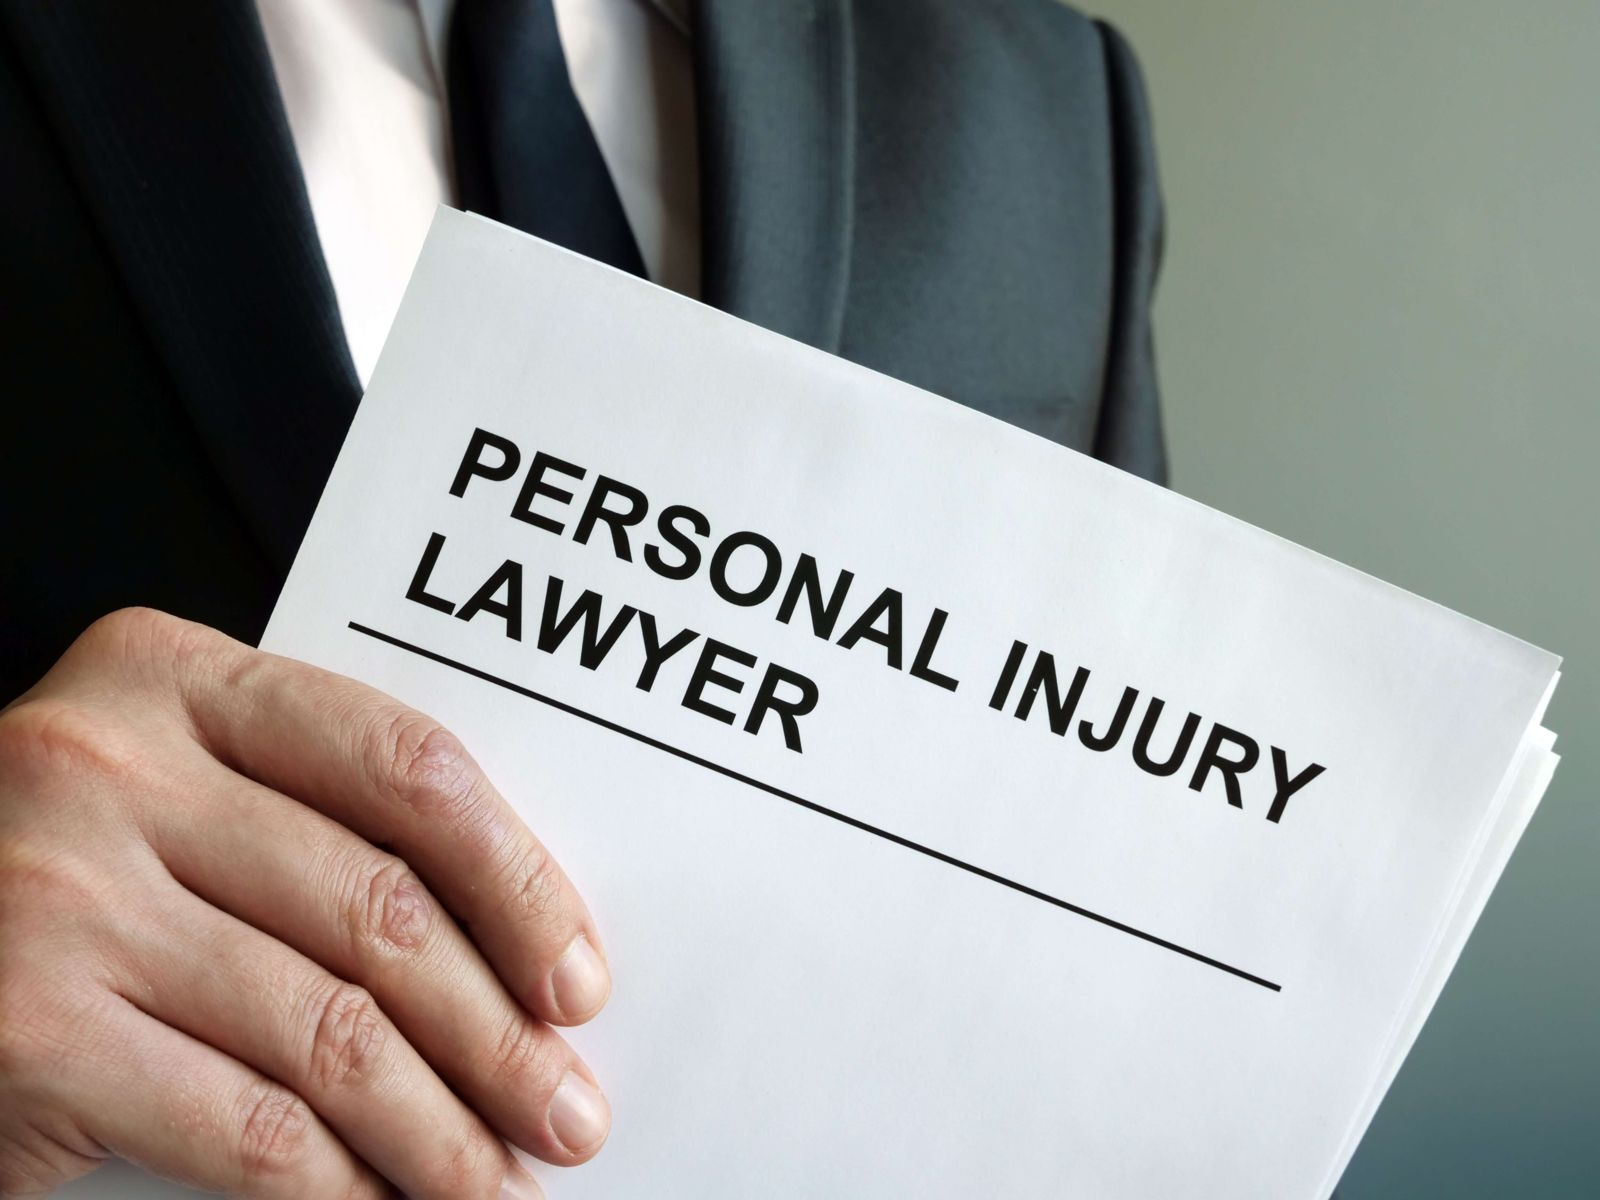 Louisiana Personal Injury Lawyer Grady Flattmann